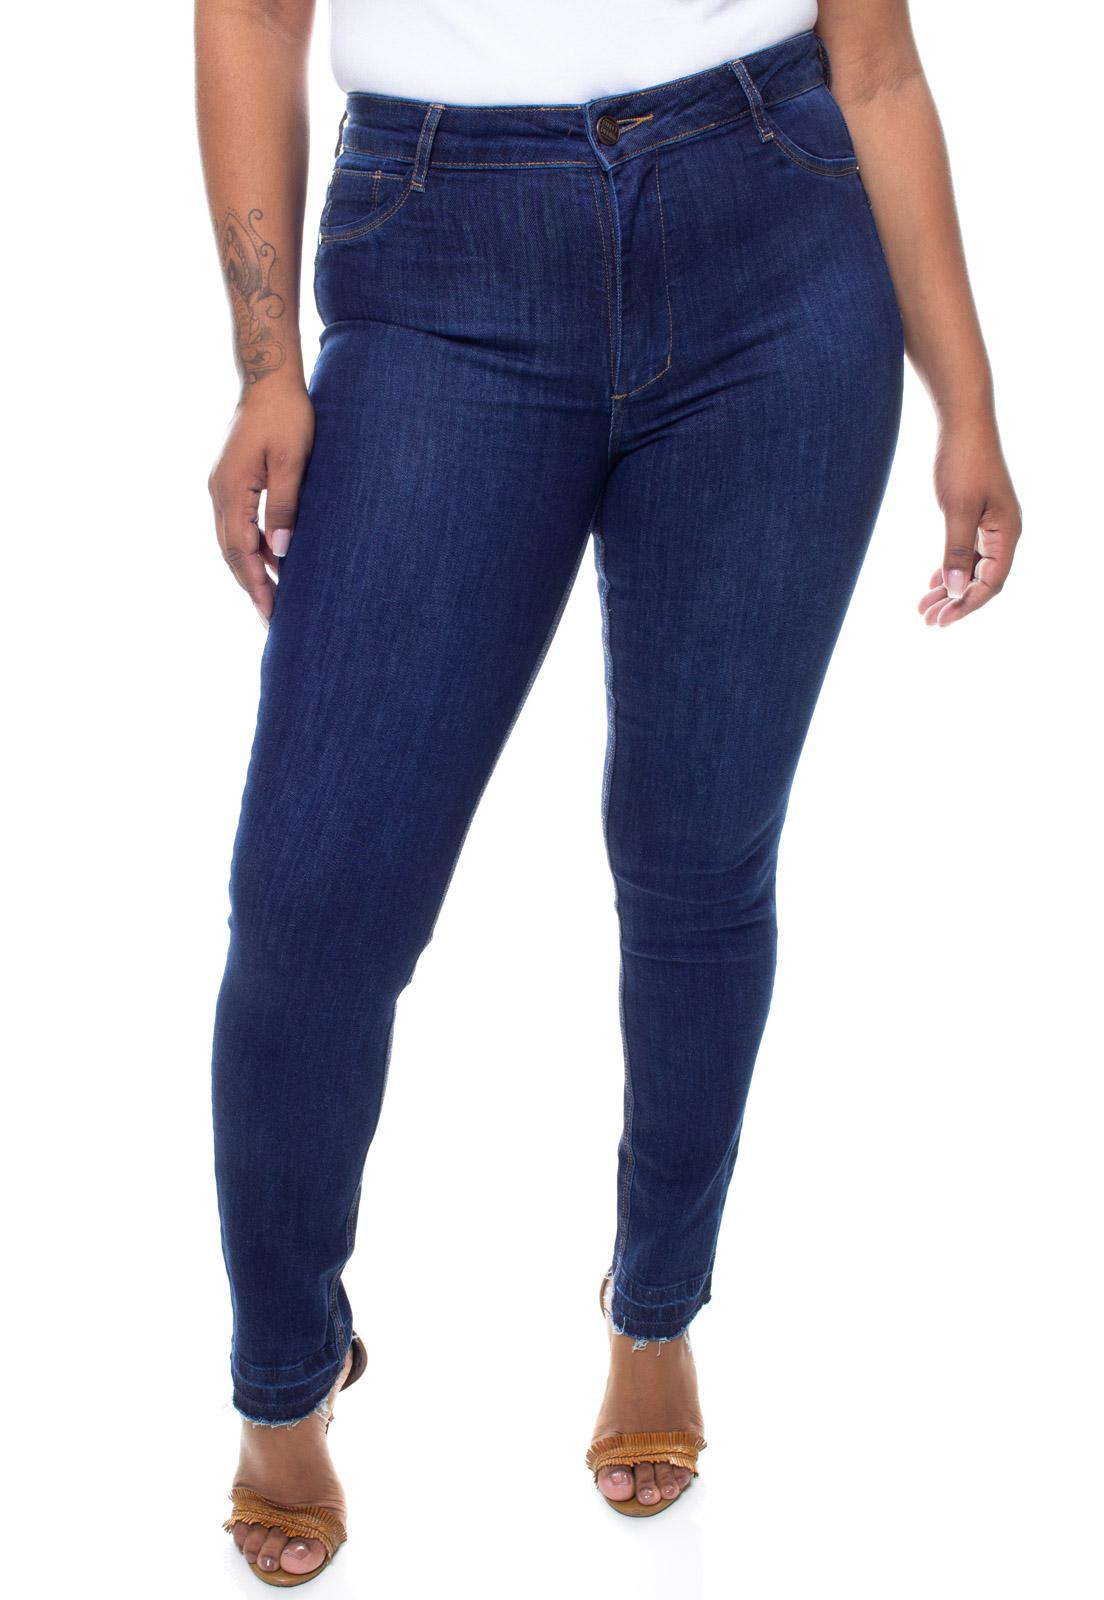 Calça Jeans Plus Size Feminina Skinny Barra Desfiada Crocker - 47578  - CROCKER JEANS